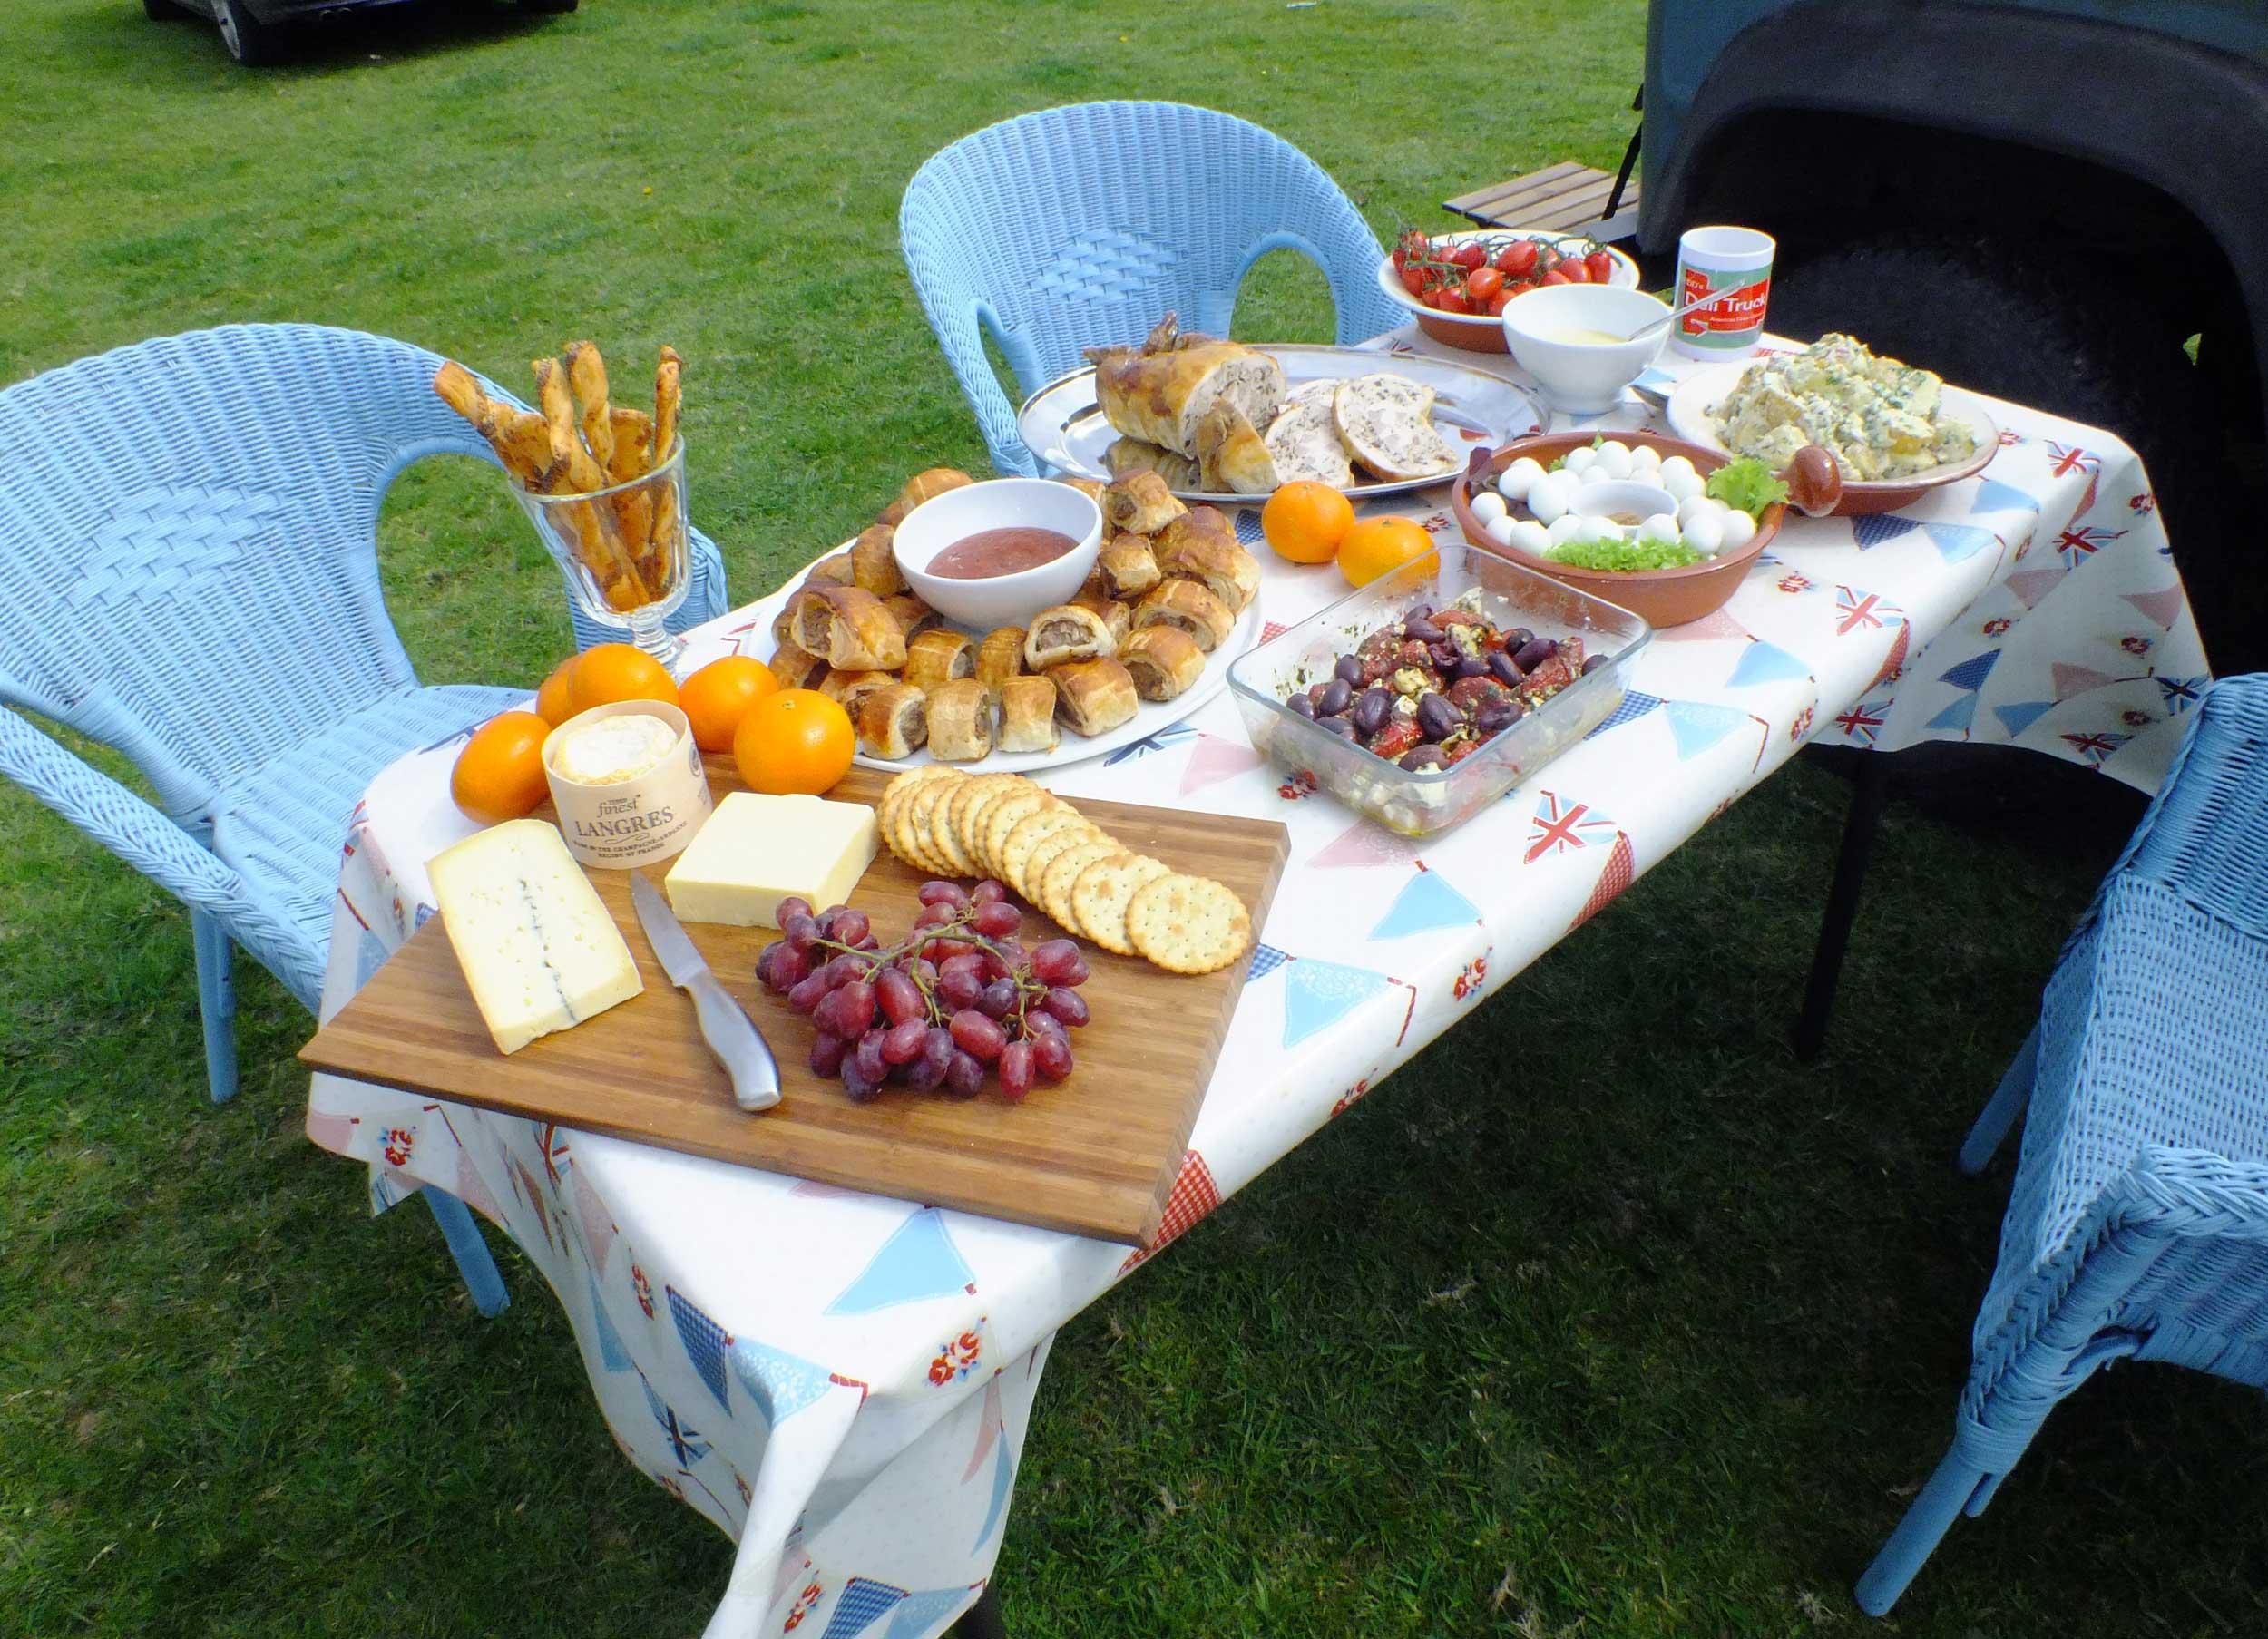 posh picnic for a horse loving raconteur the deli truck